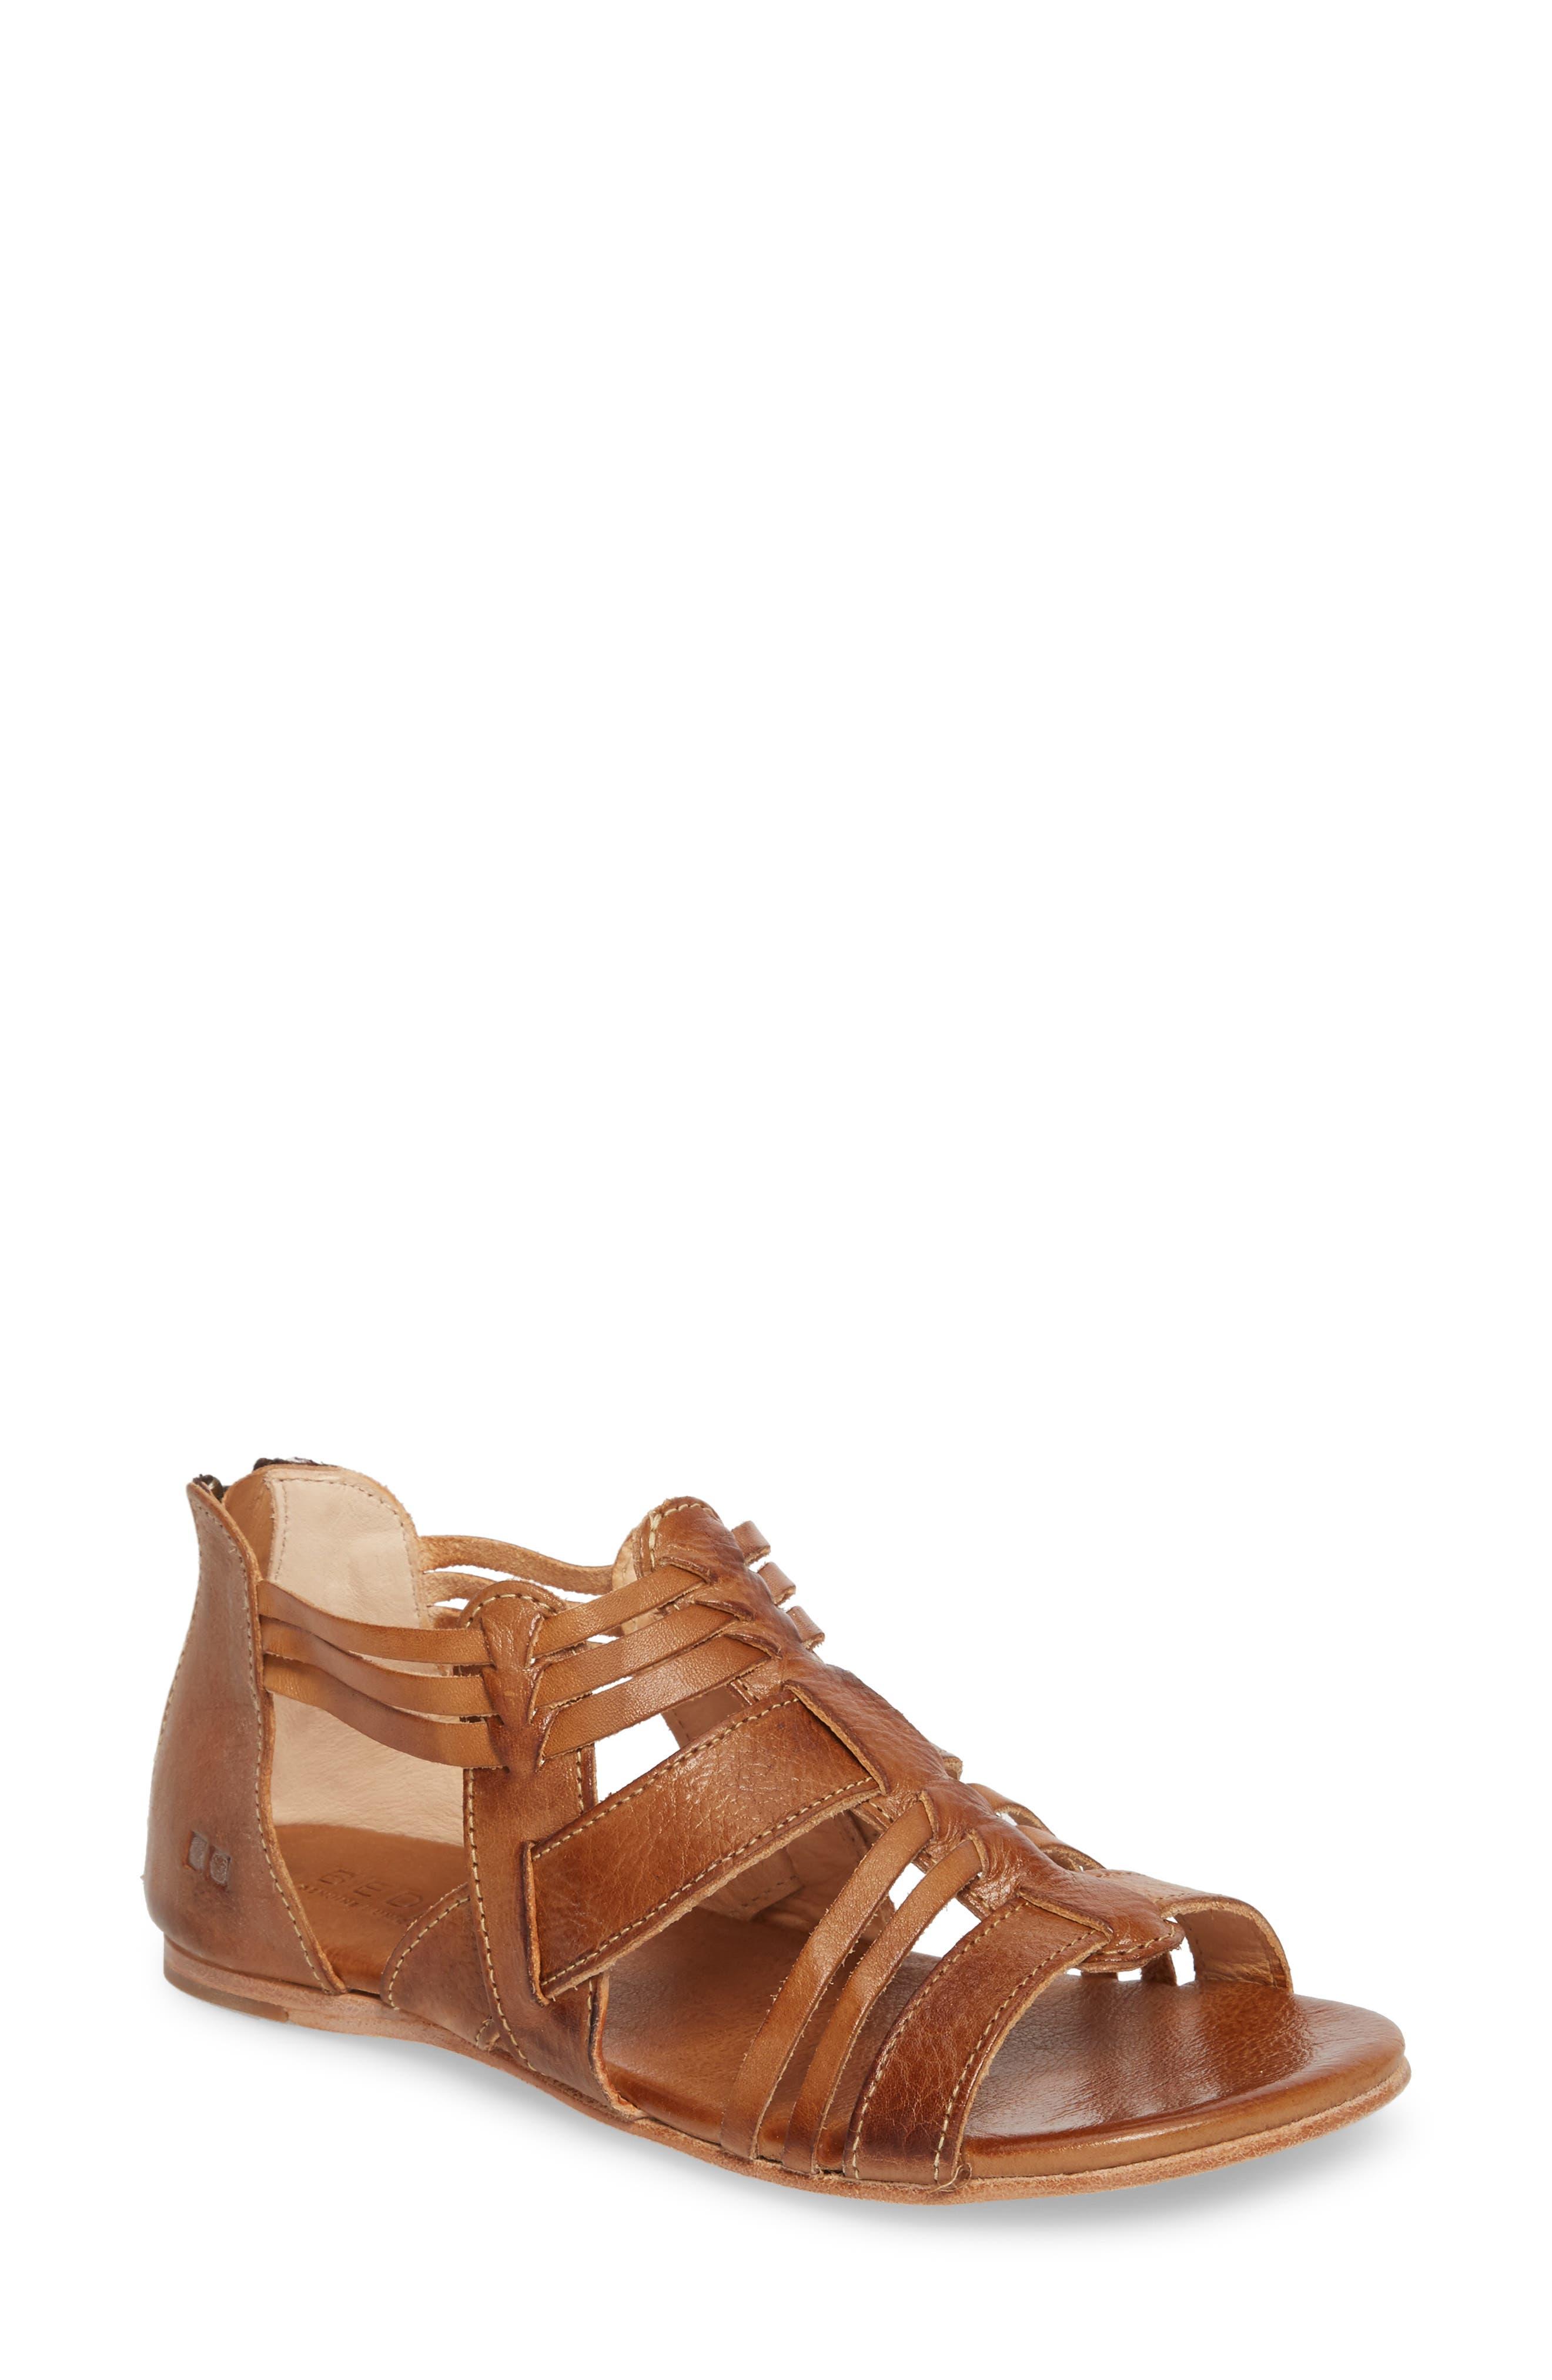 Cara Sandal,                         Main,                         color, Tan Leather